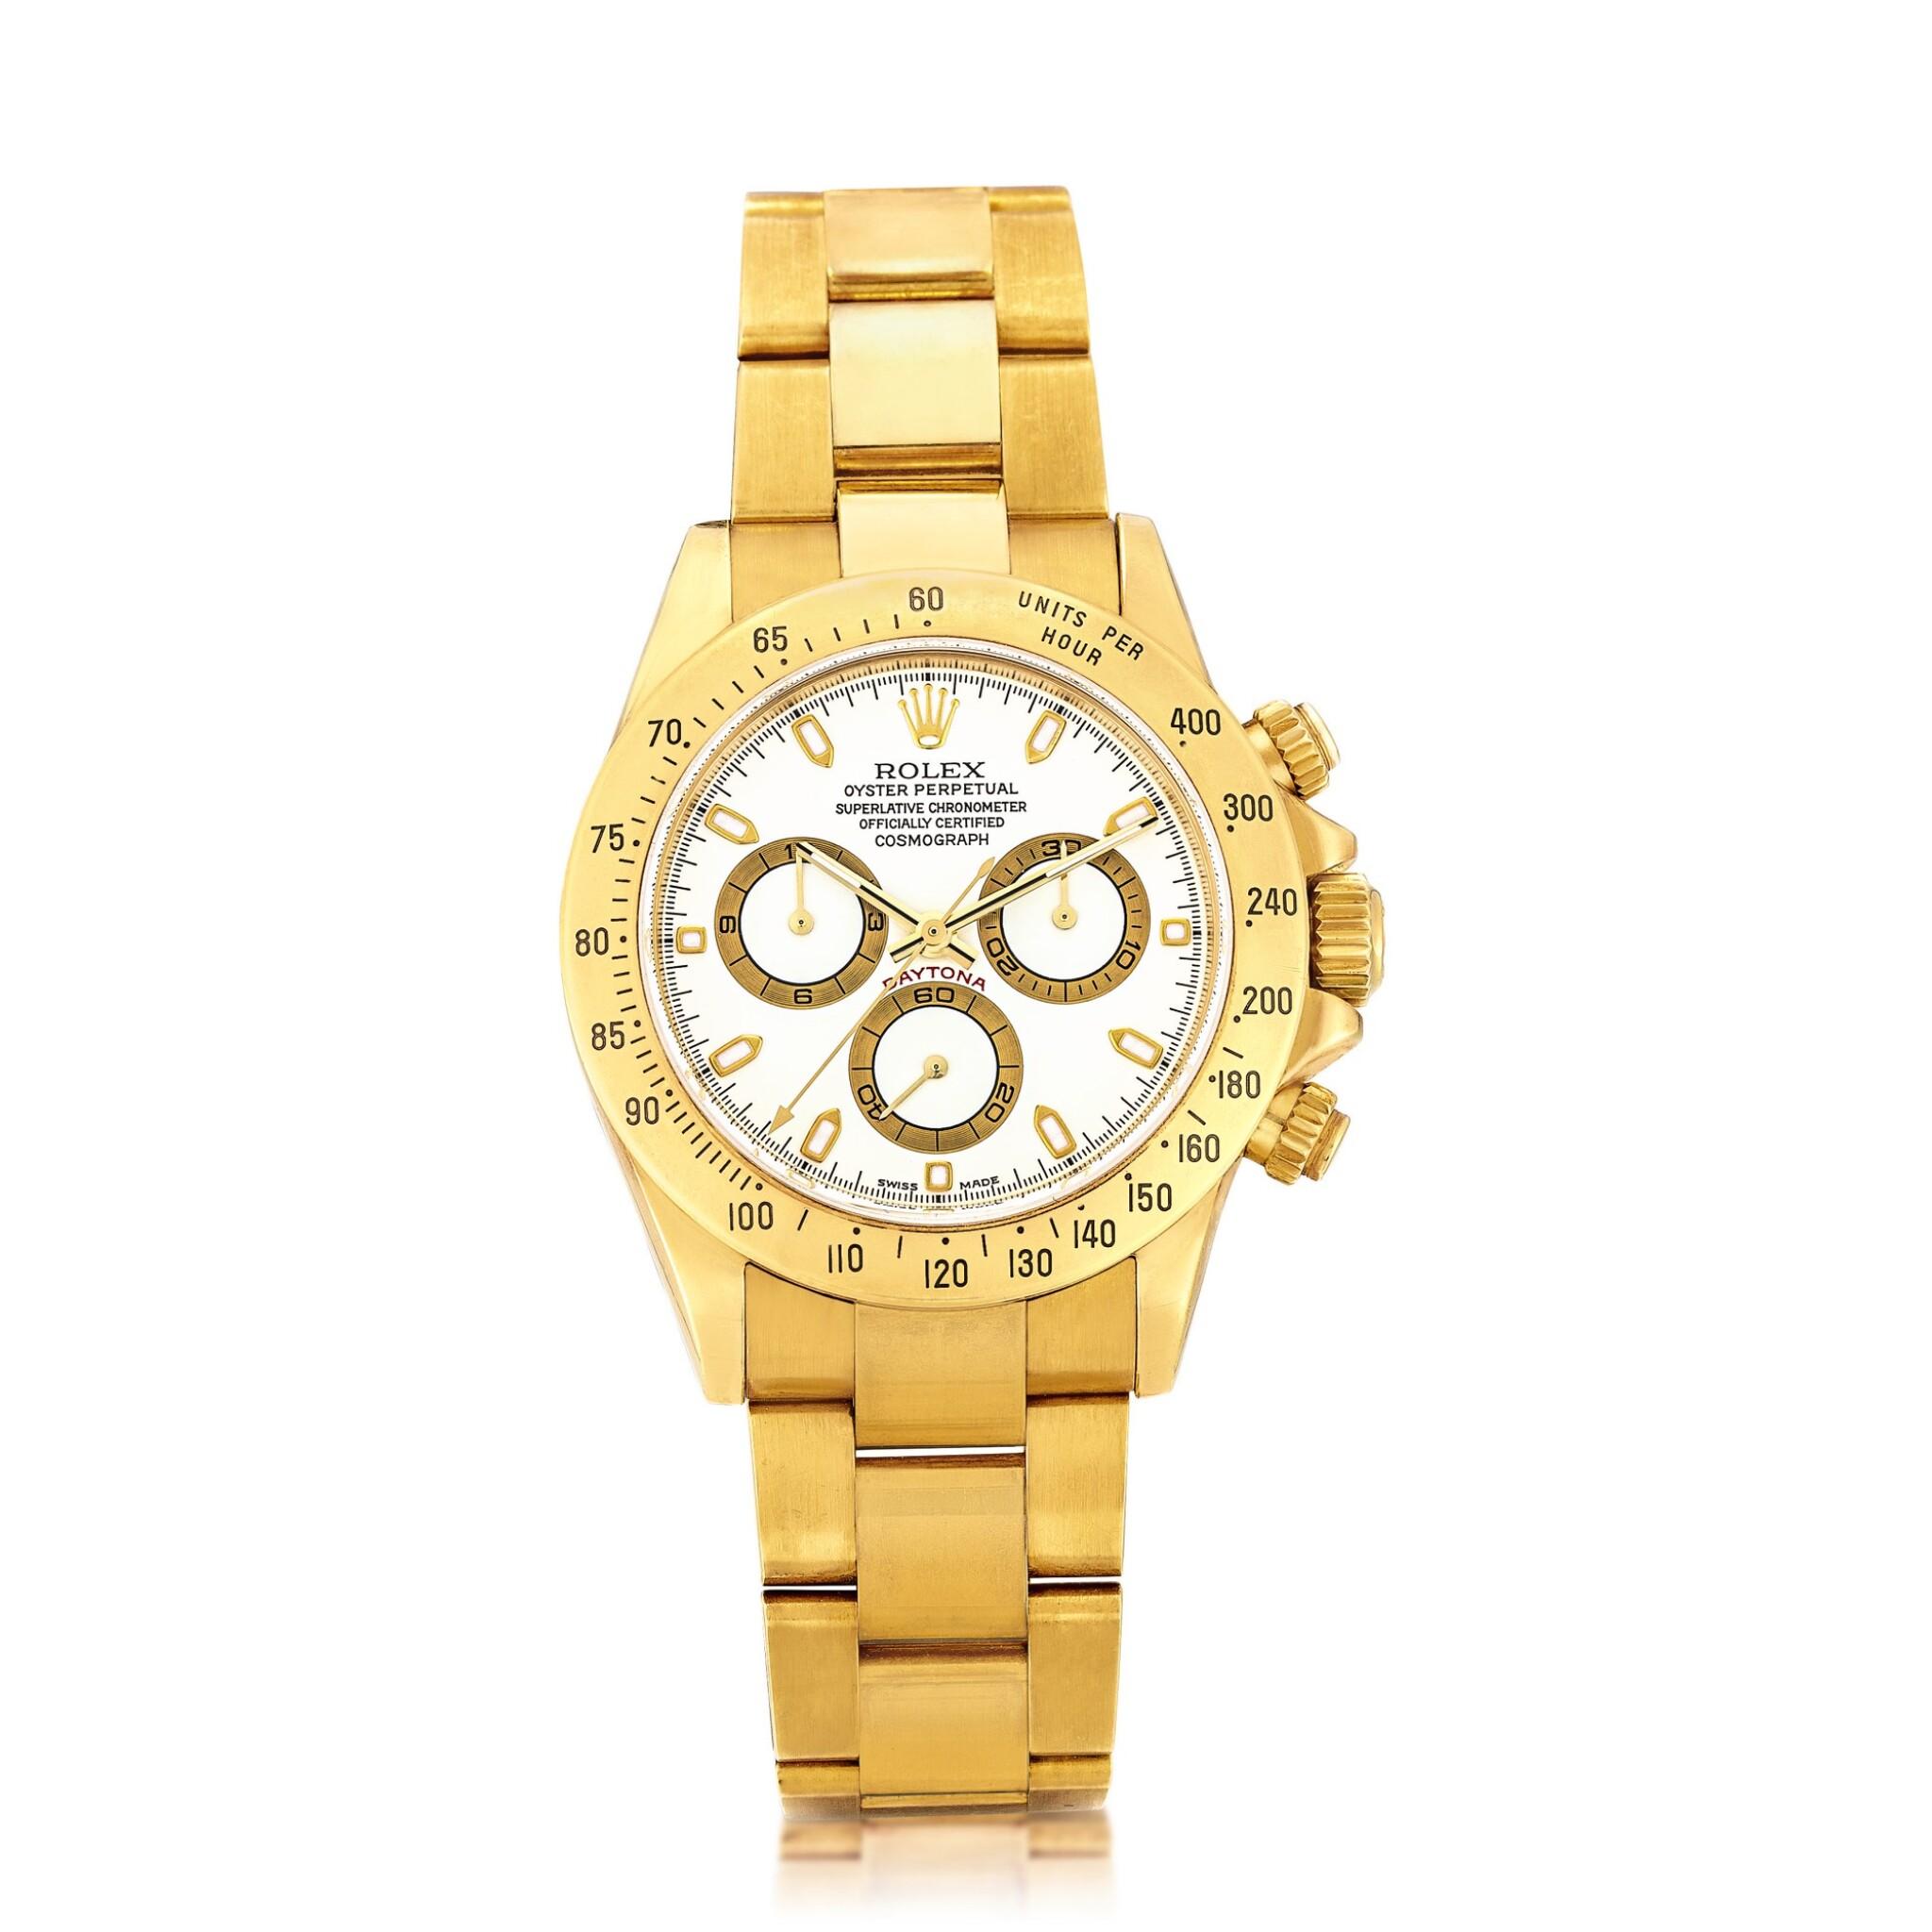 View full screen - View 1 of Lot 2150. Rolex | Cosmograph Daytona, Reference 116528, A yellow gold chronograph wristwatch with bracelet, Circa 2000 | 勞力士 | Cosmograph Daytona 型號116528  黃金計時鏈帶腕錶,約2000年製.